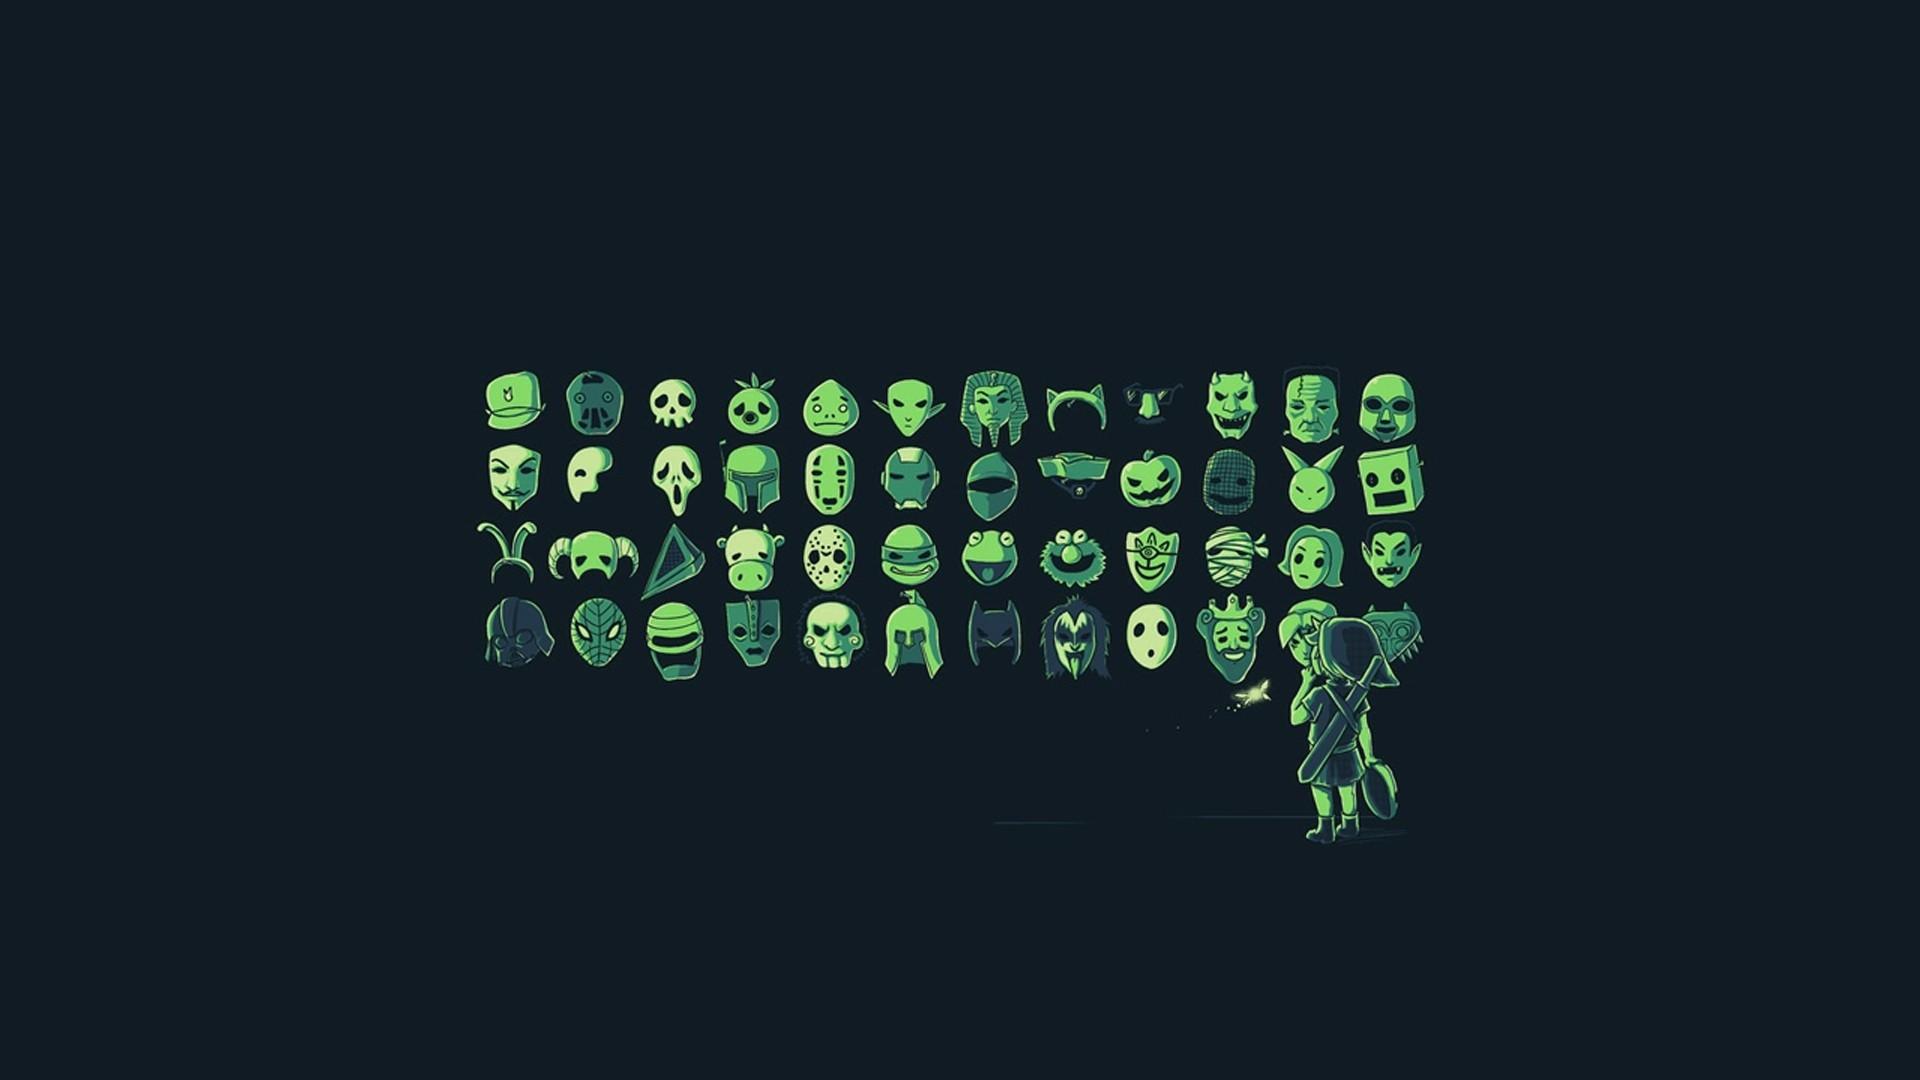 Wallpaper Illustration Video Games Artwork Mask Text Logo